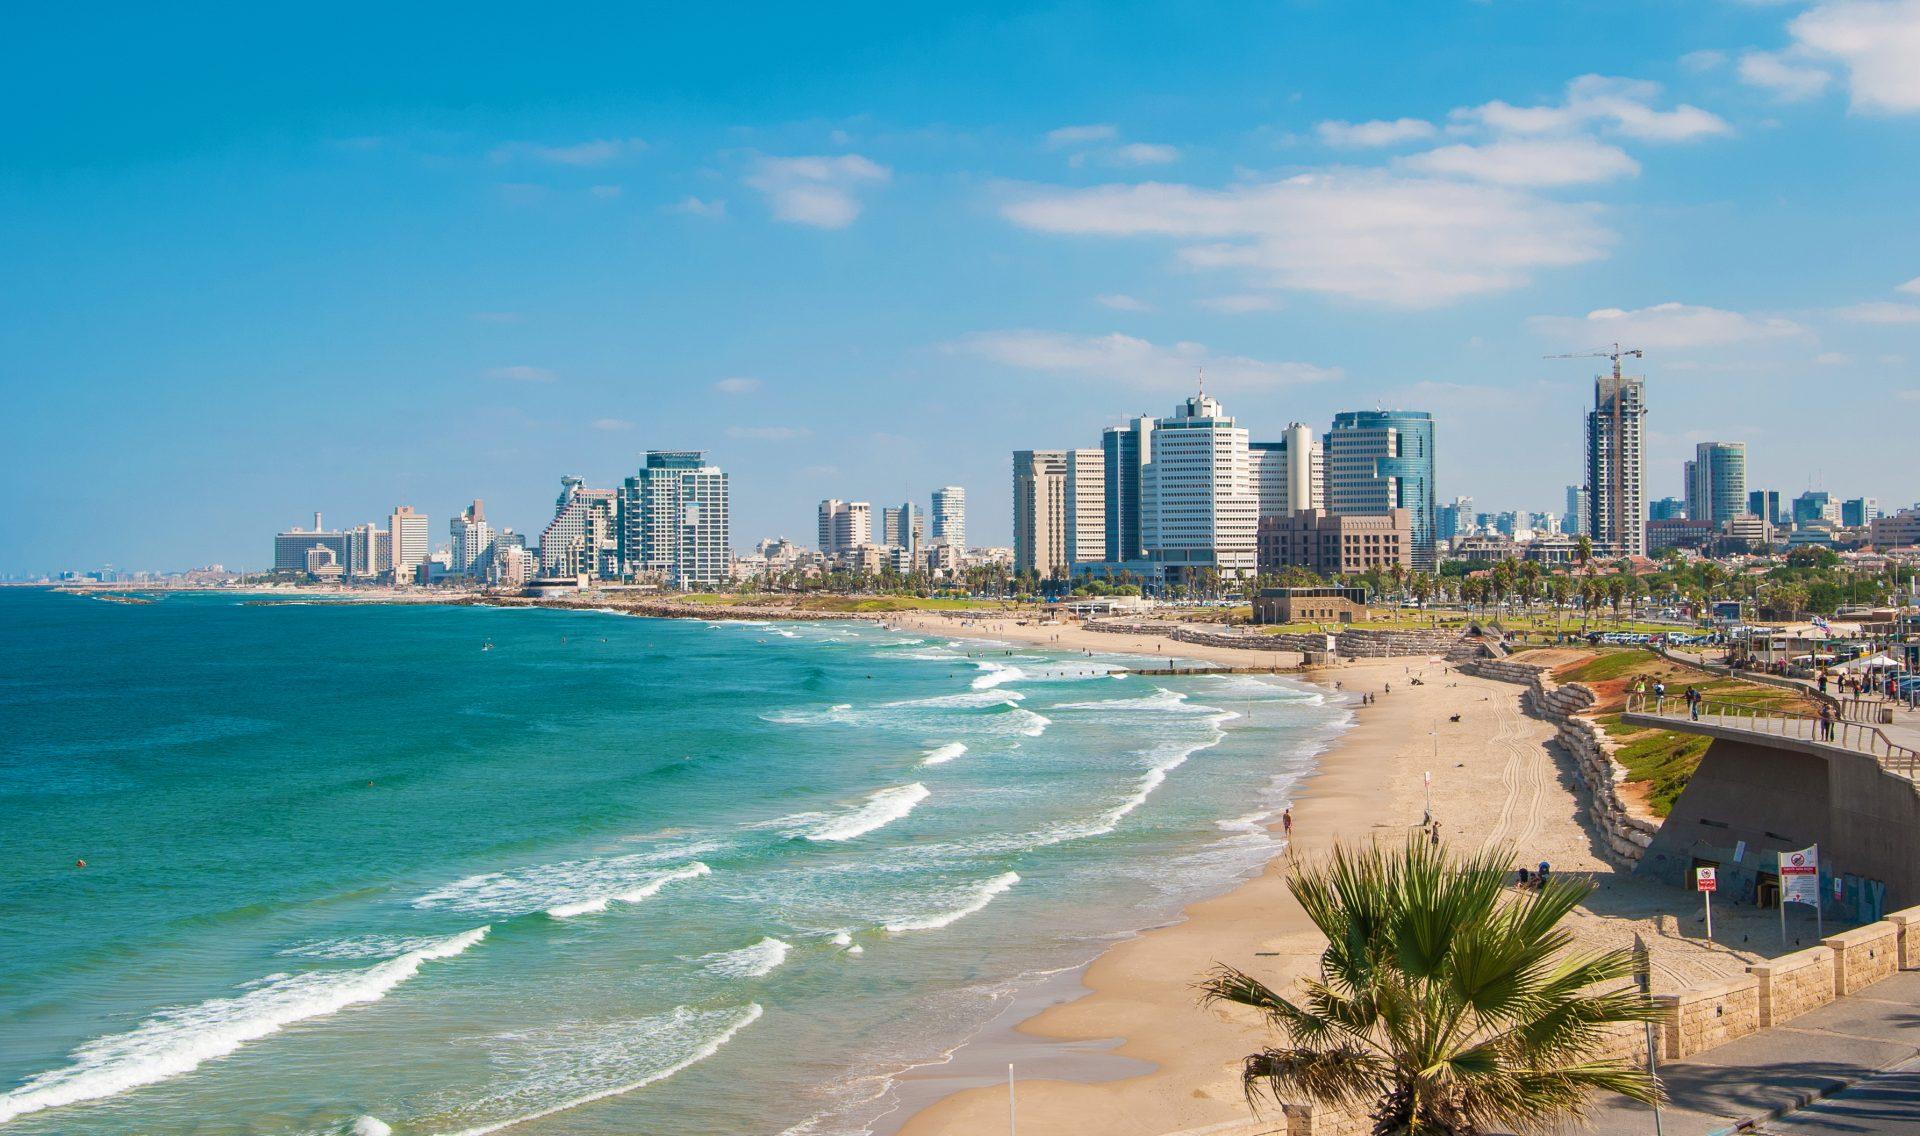 Tel Aviv Beach 3 Scaled 1